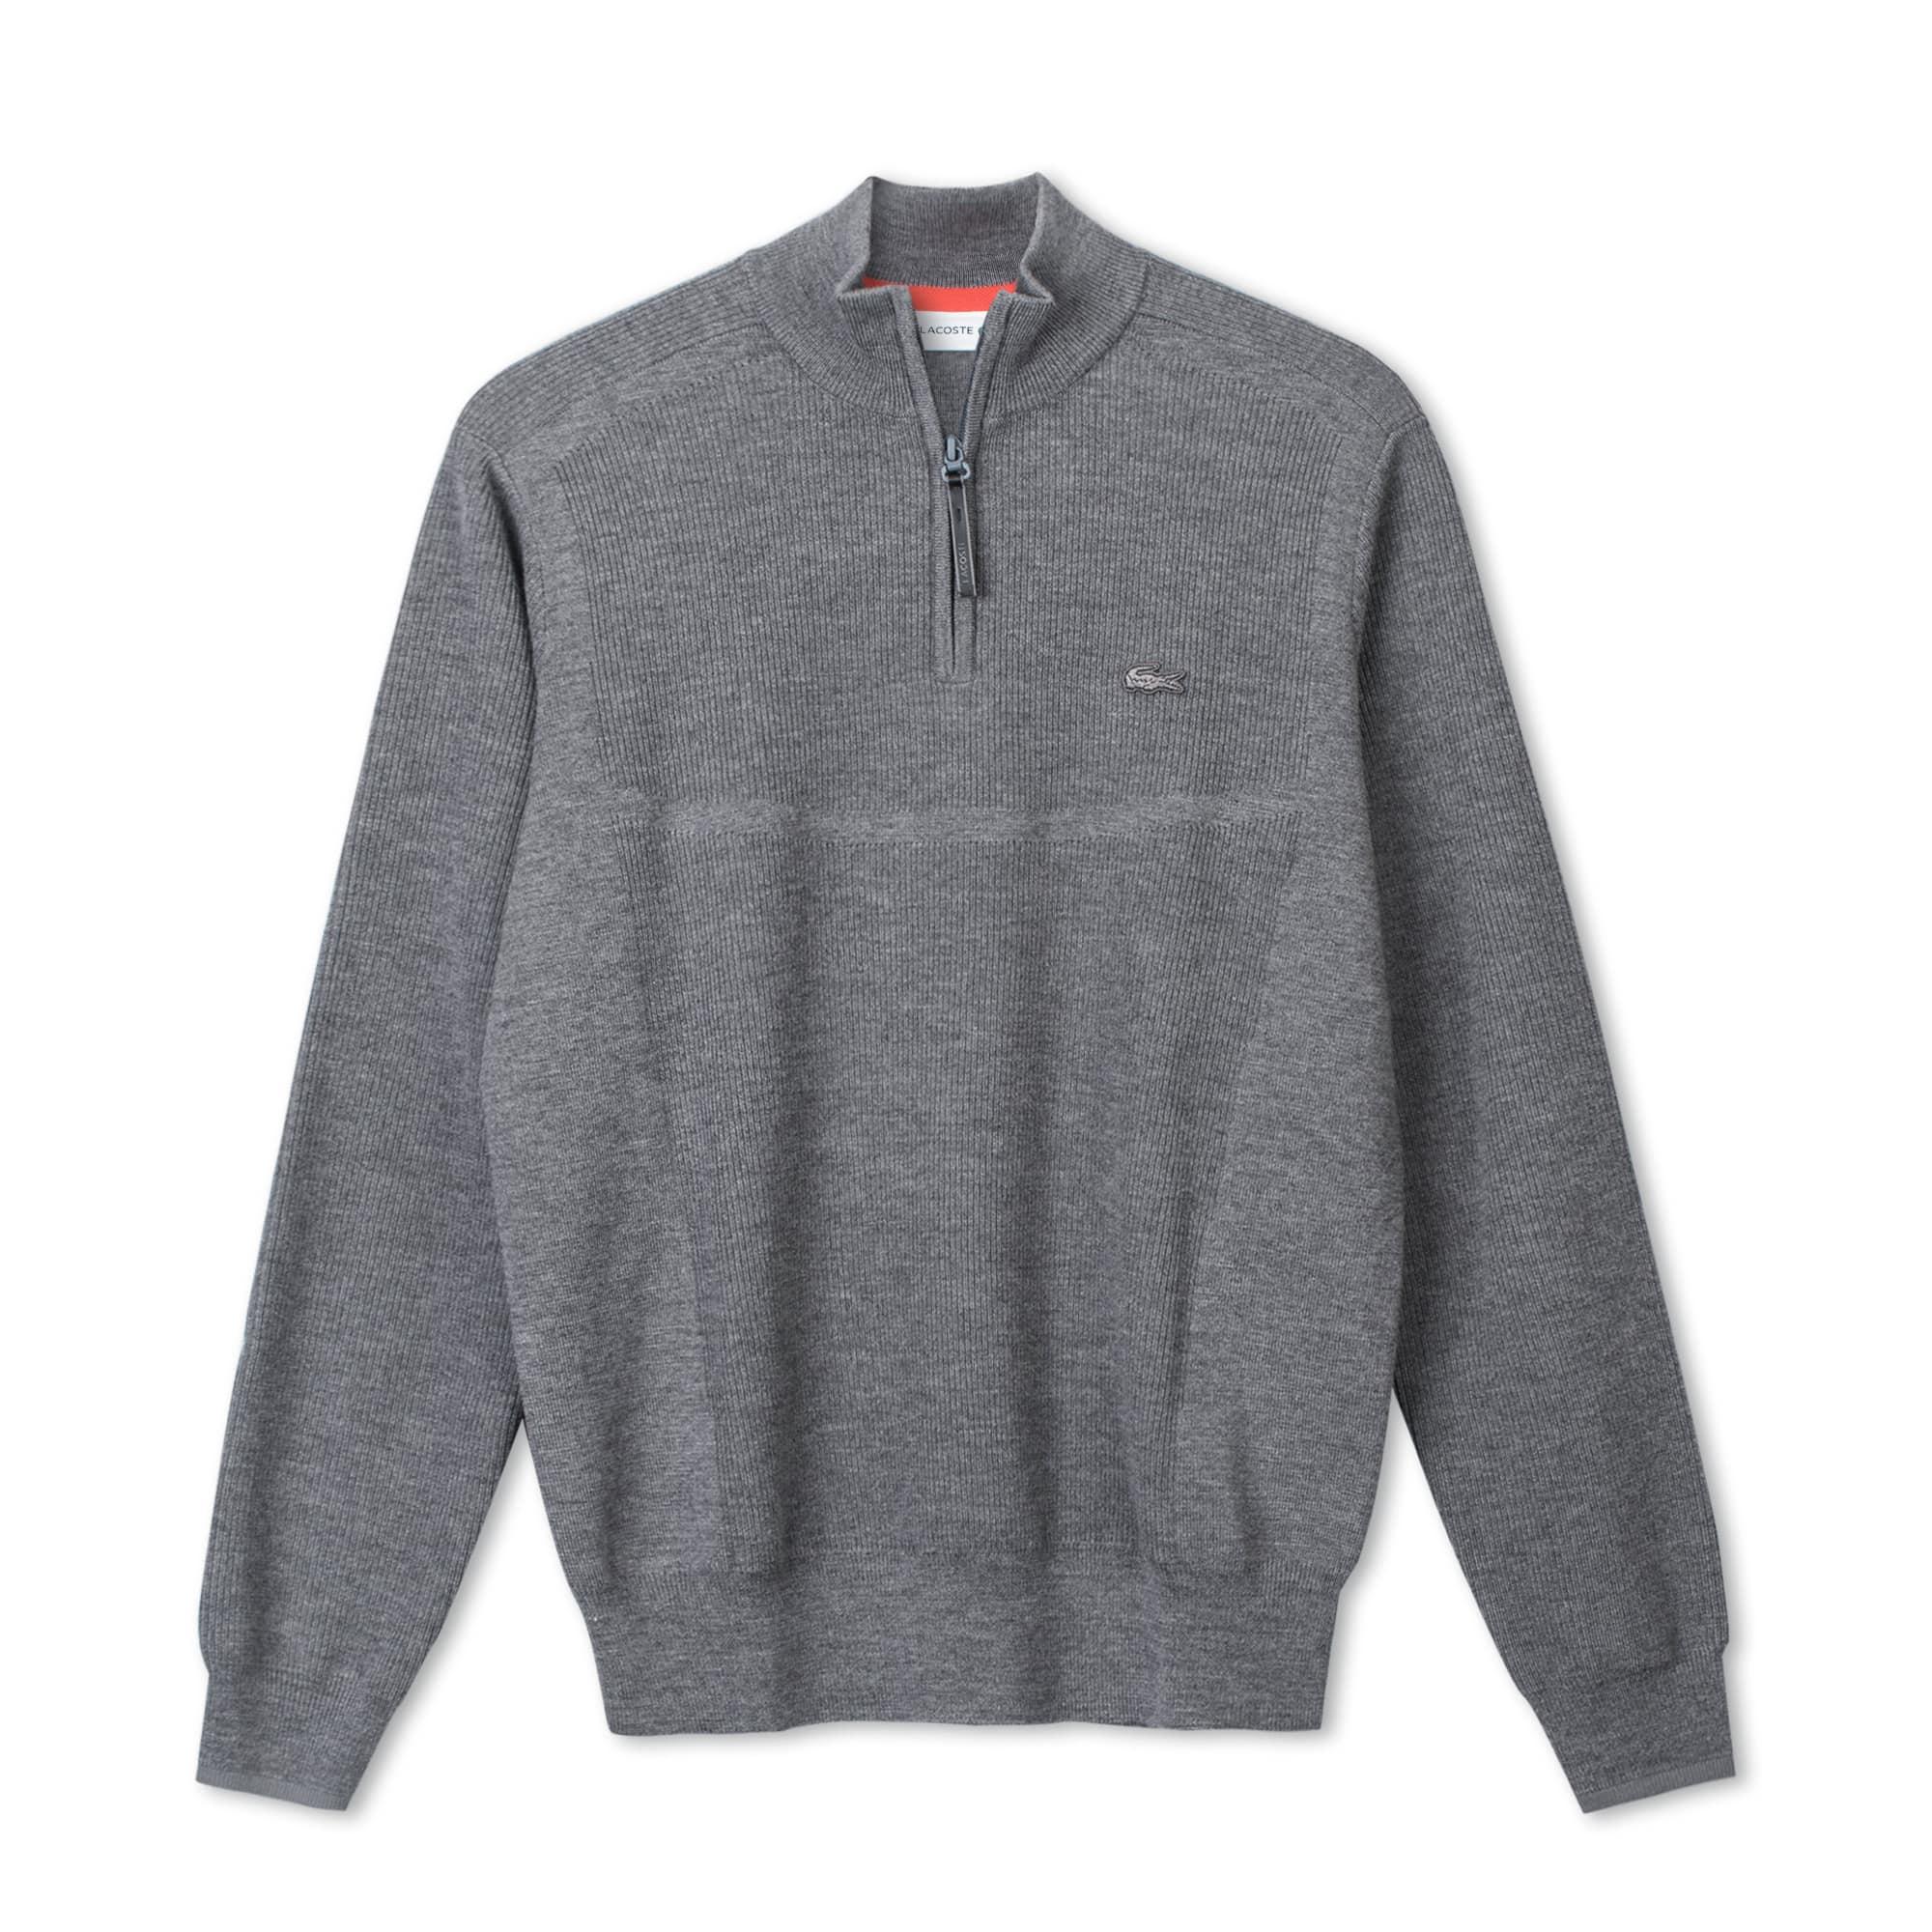 Lacoste Motion系列男士拉链立领罗纹羊毛衫